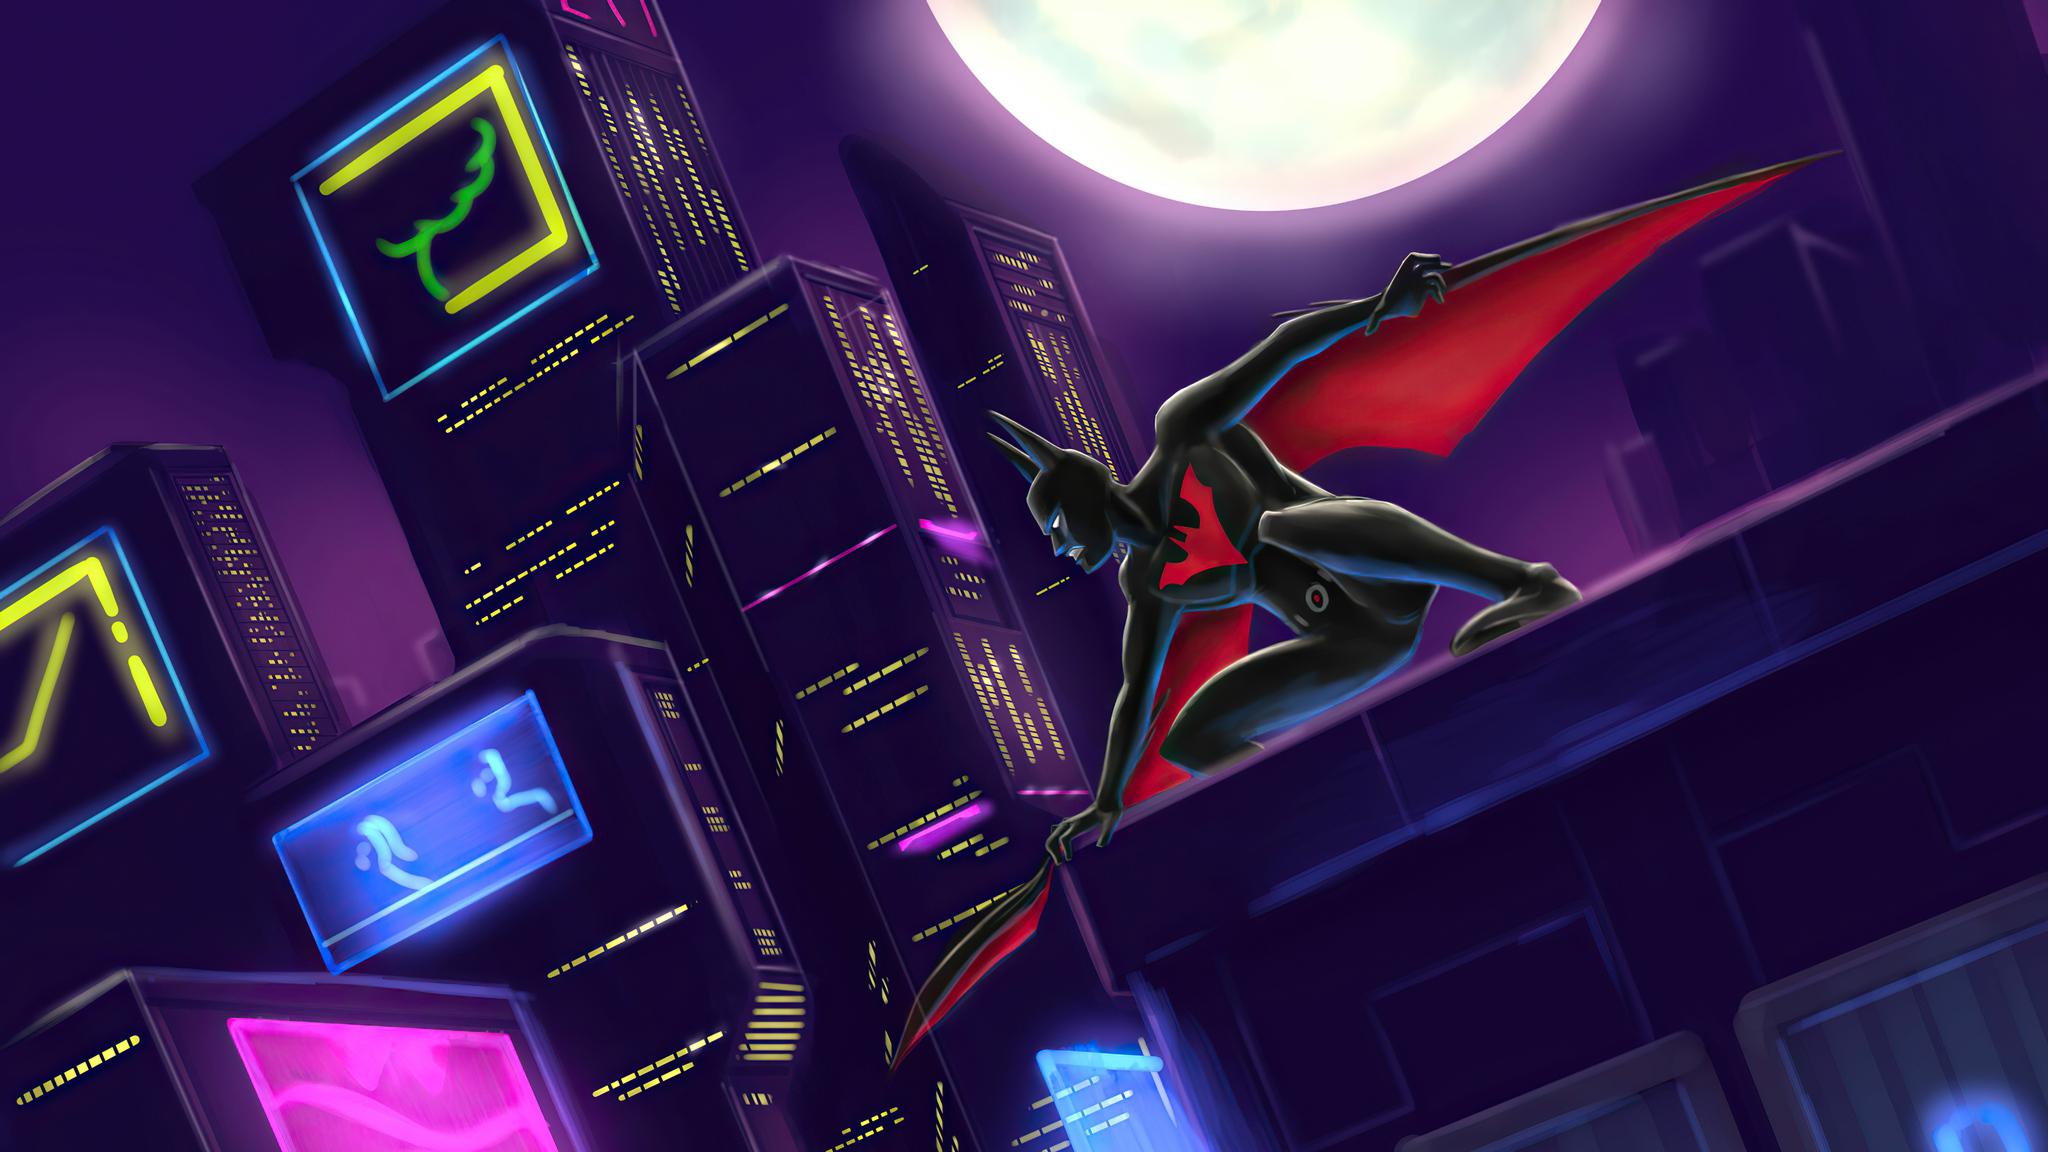 2048x1152 4k Batman Beyond 2020 2048x1152 Resolution HD 4k ...